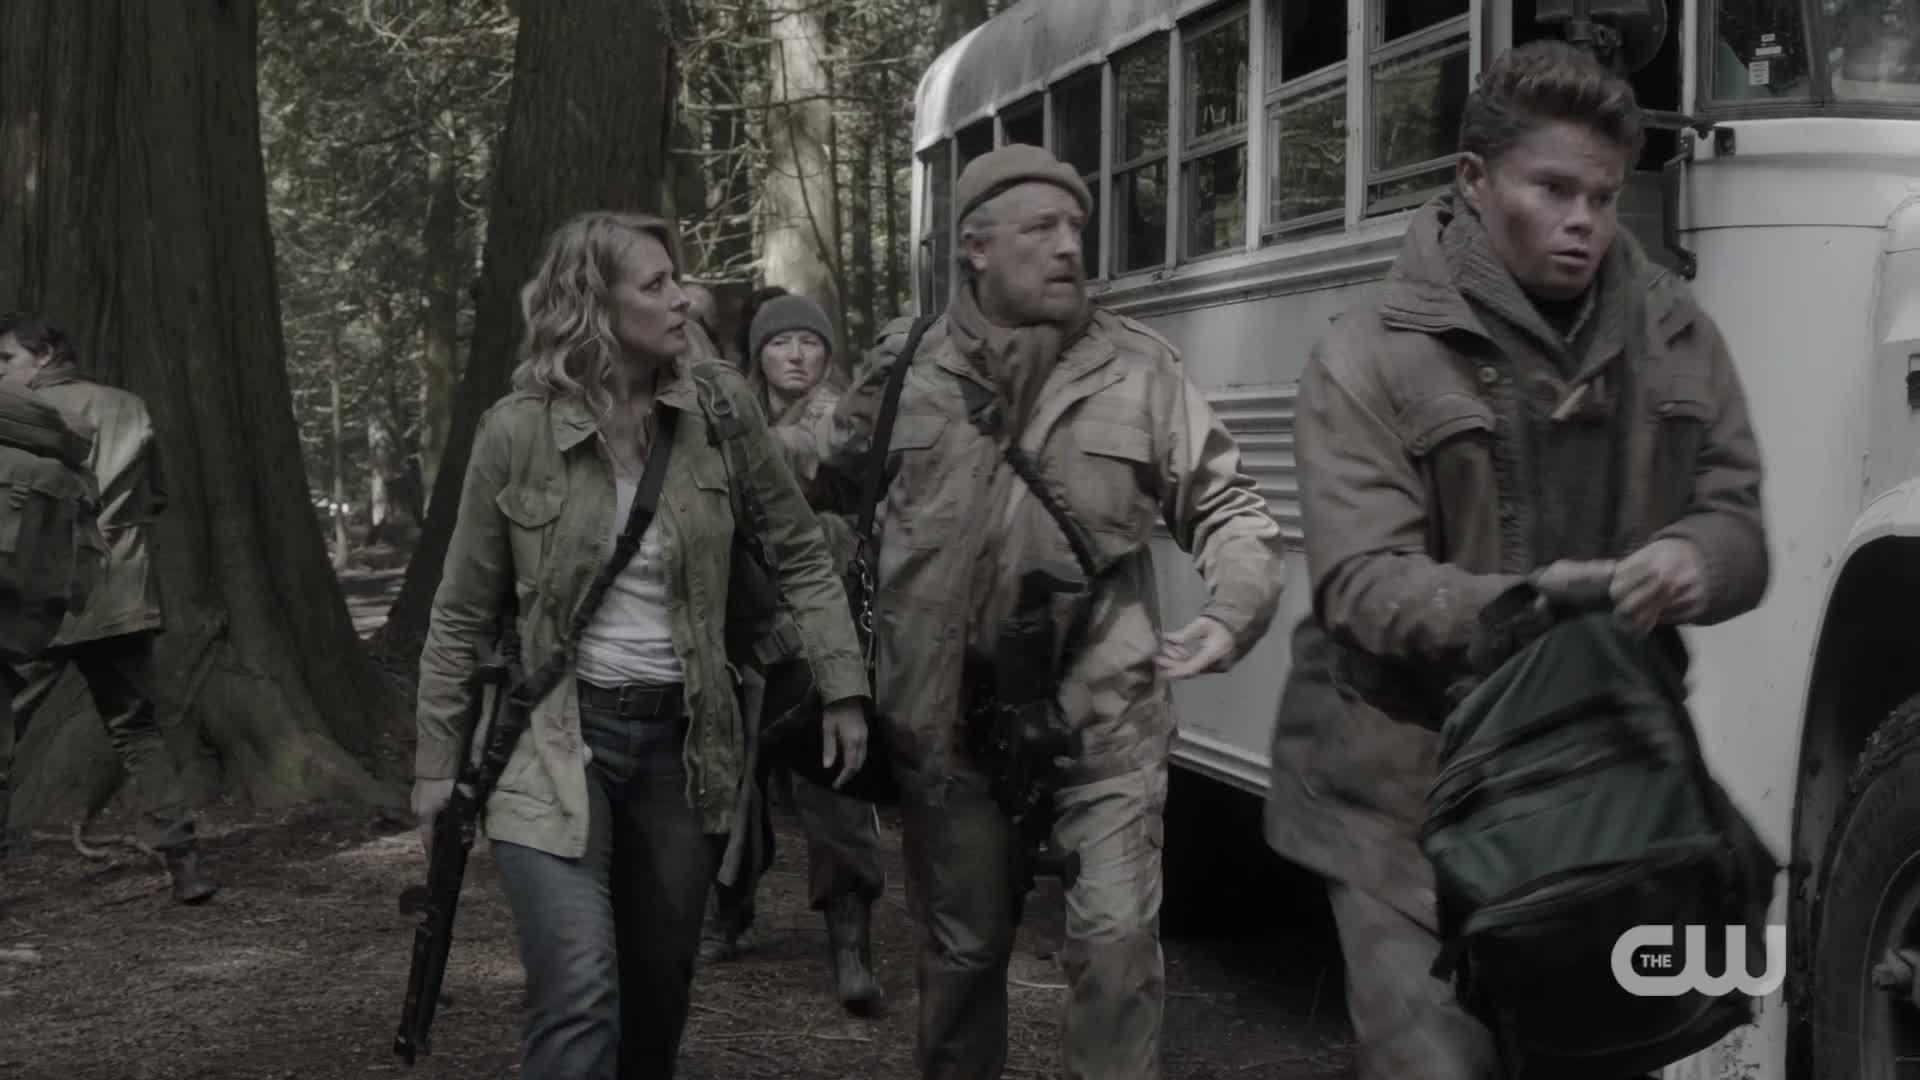 Supernatural | Supernatural Comic-Con® 2018 Trailer | The CW